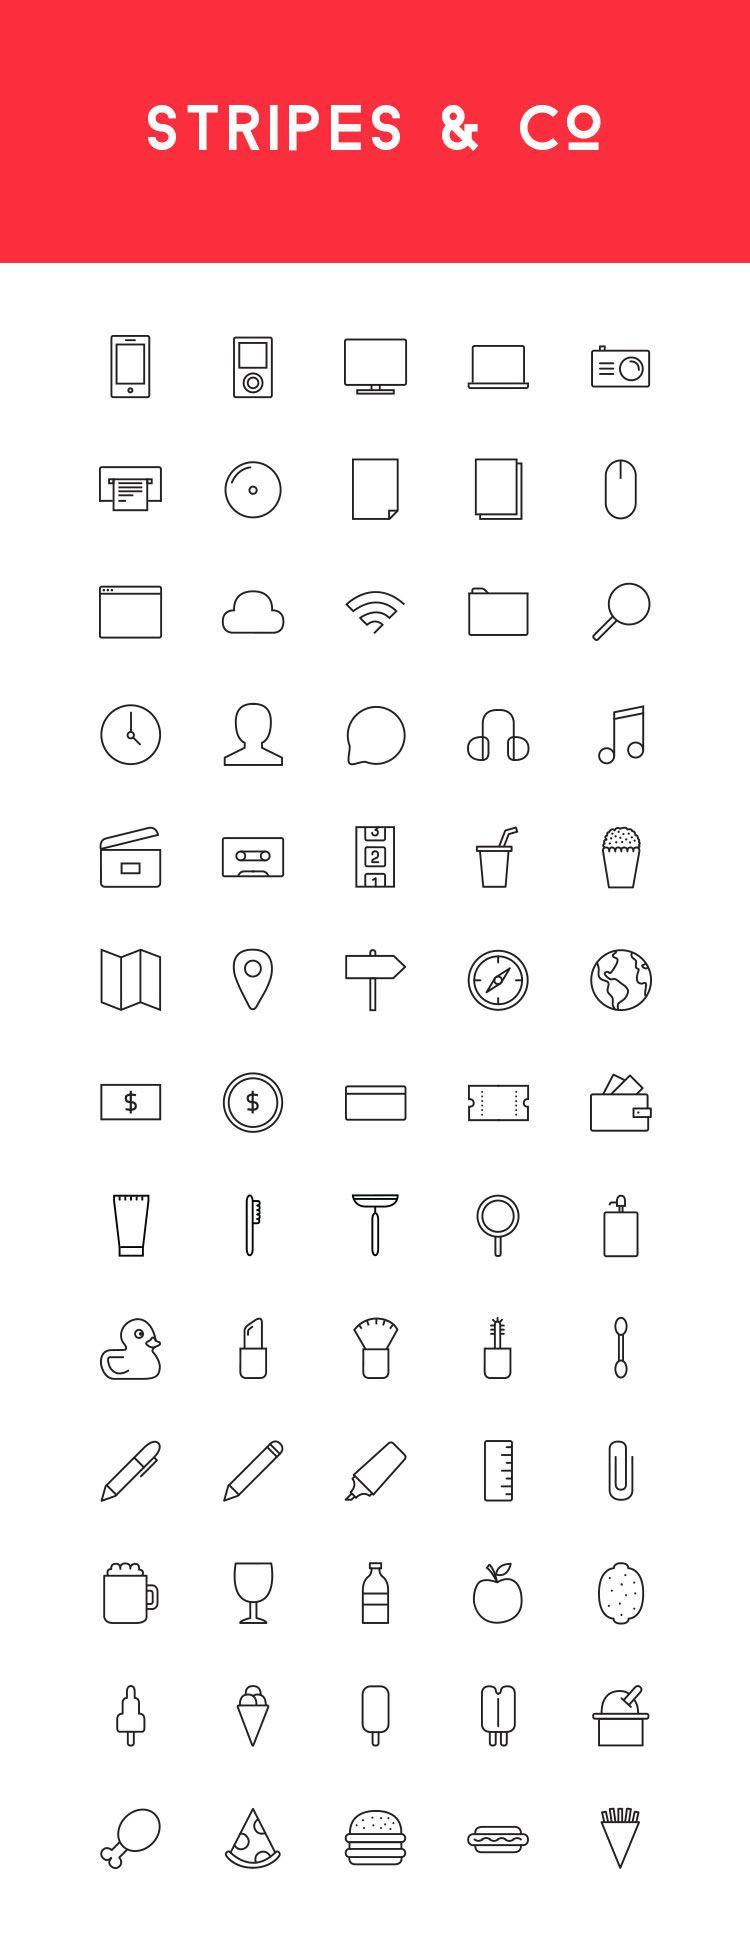 Stripes & Co Line Styled Icon Set